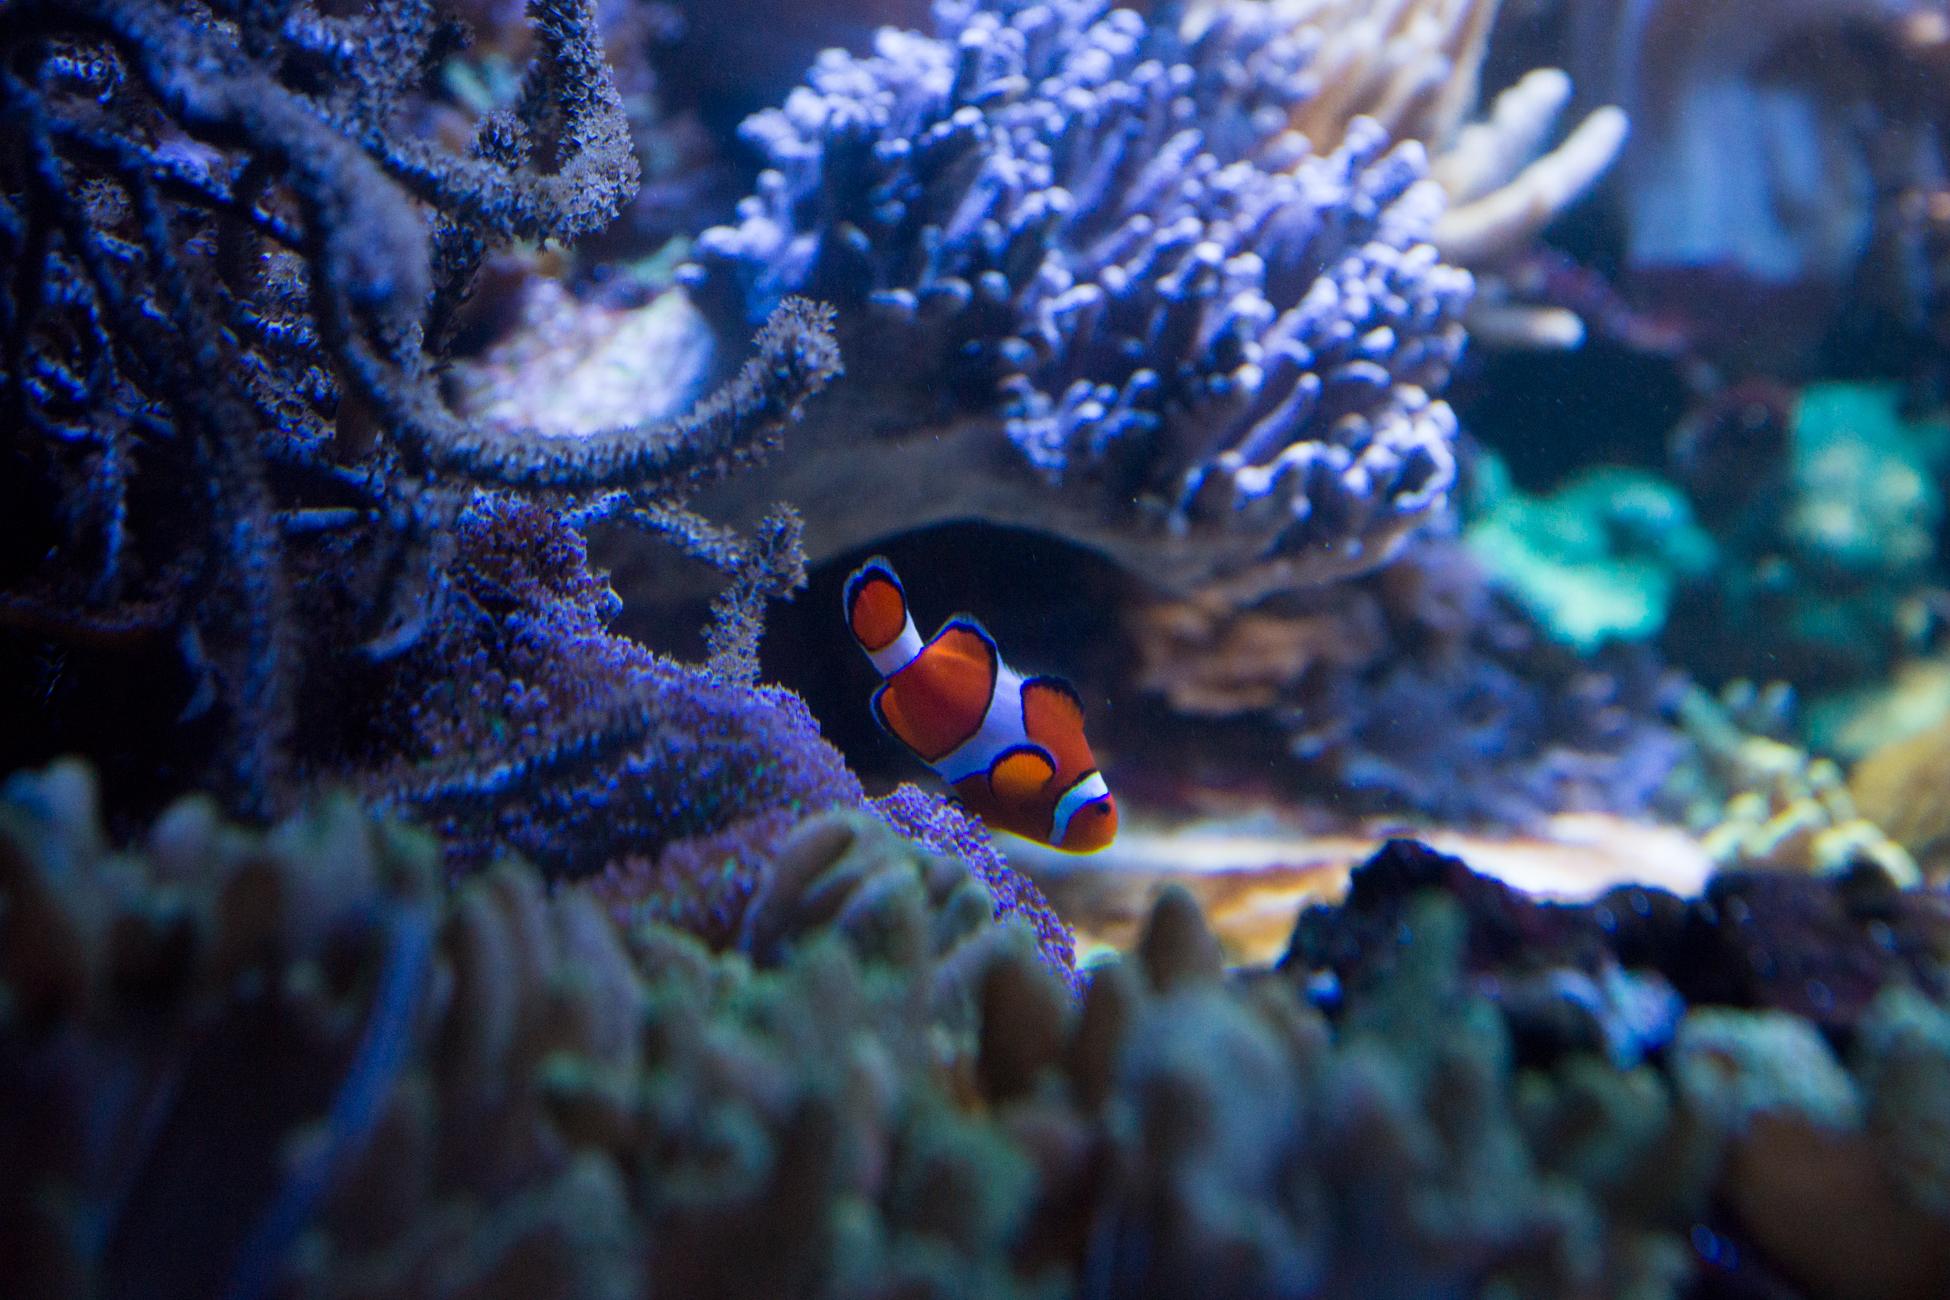 Baltimore Inner Harbor and National Aquarium (c) My3GirlsPhotography May 2017-25.jpg